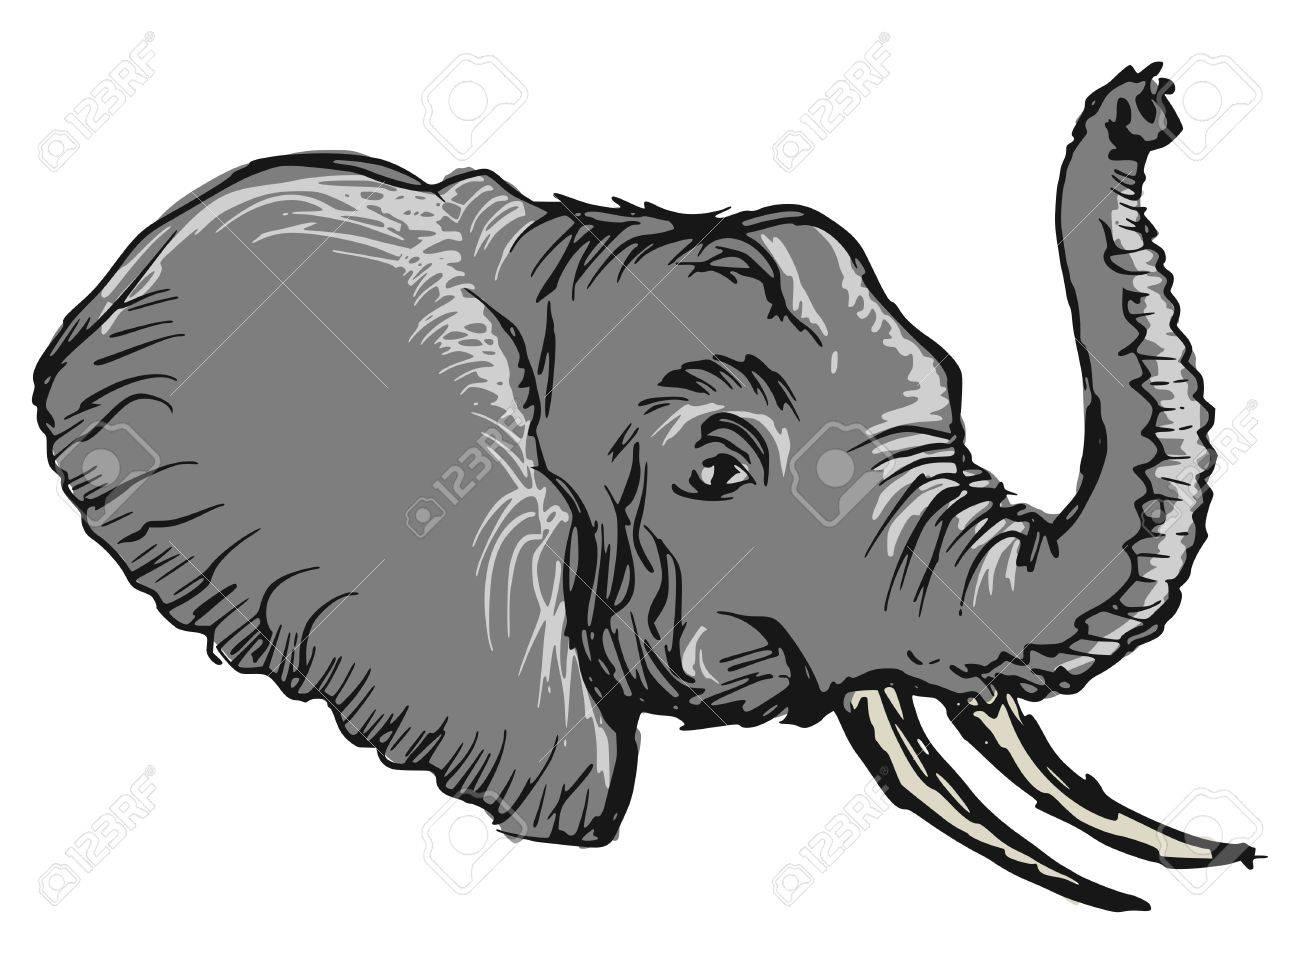 Cartoon Hand Drawn Illustration Of Head Of Elephant Royalty Free ...